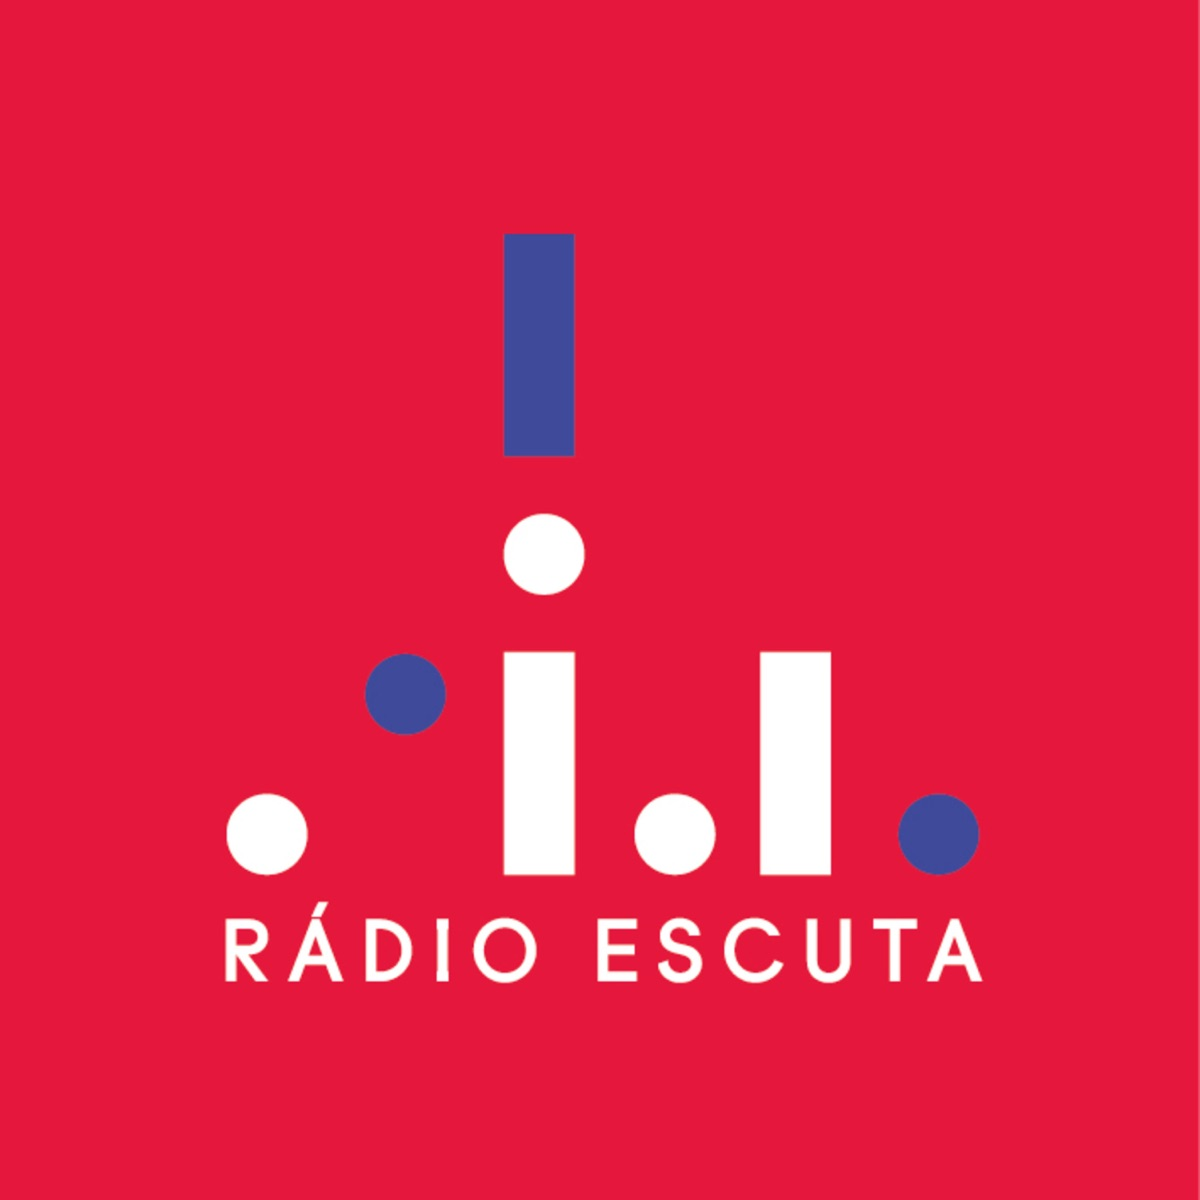 Rádio Escuta